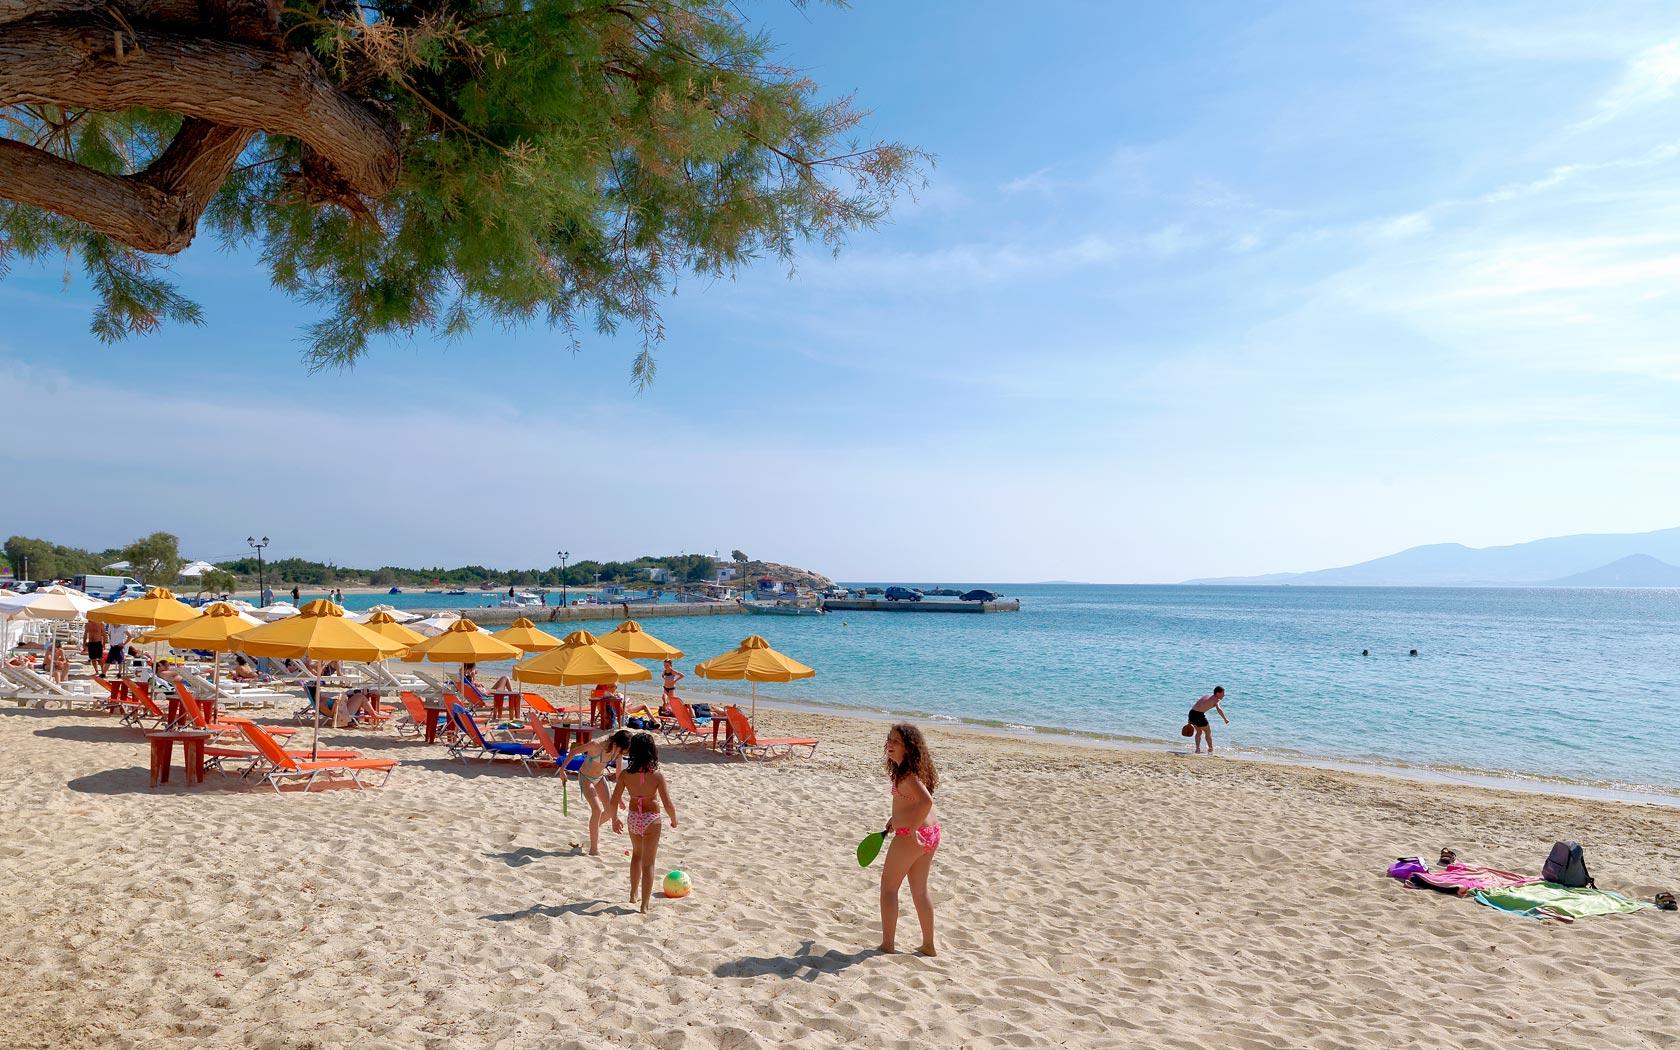 Naxos hotels iria beach hotel naxos agia anna - Villaggio giardini naxos all inclusive ...